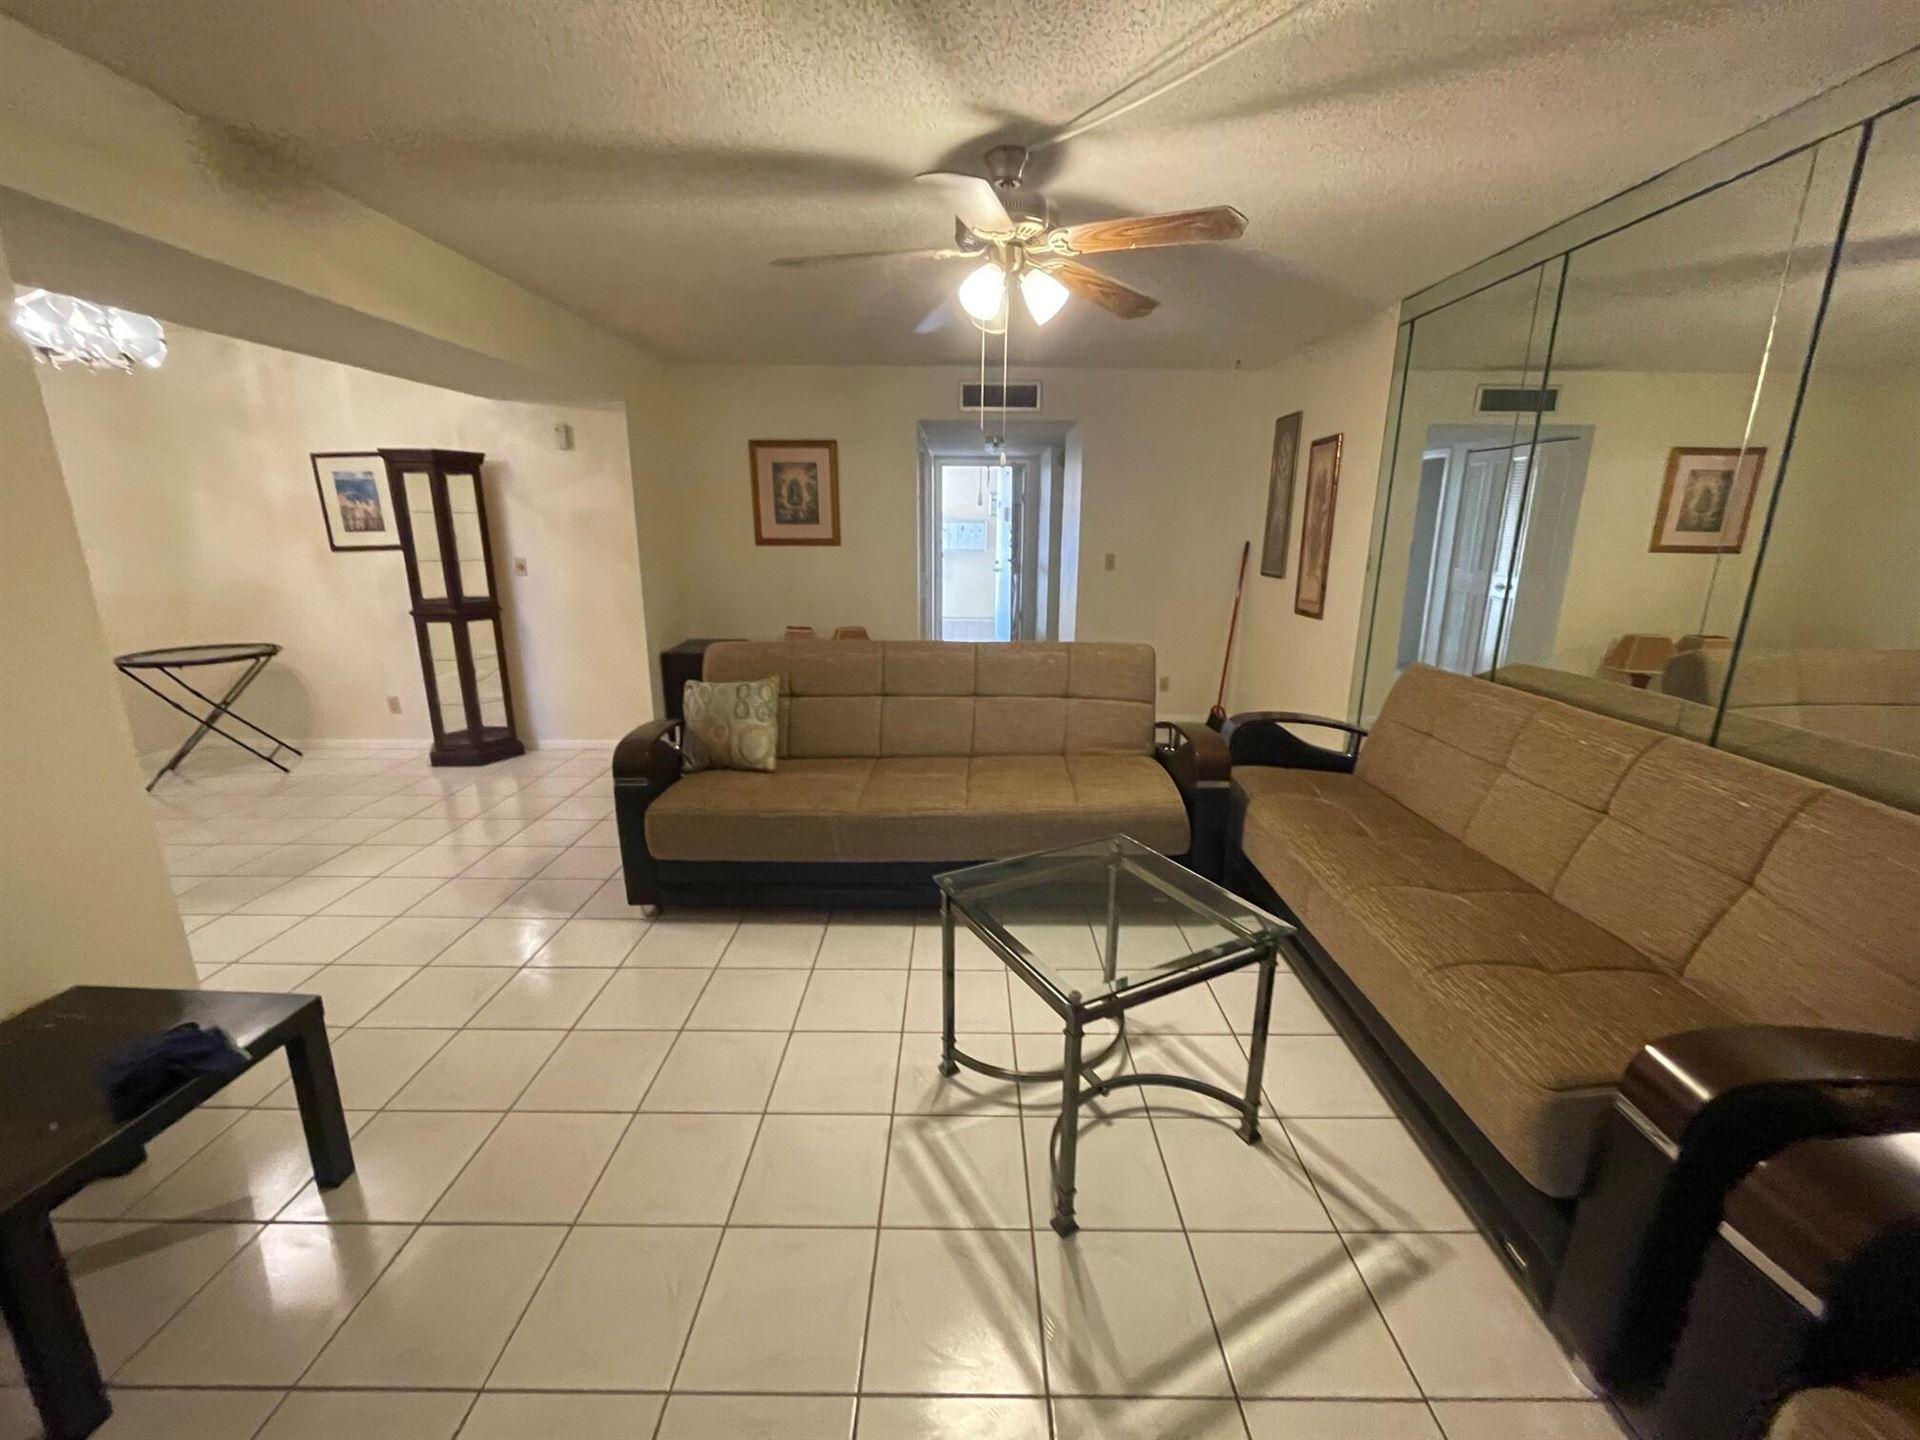 3524 Via Poinciana 103 #103, Lake Worth, FL 33467 - MLS#: RX-10689650